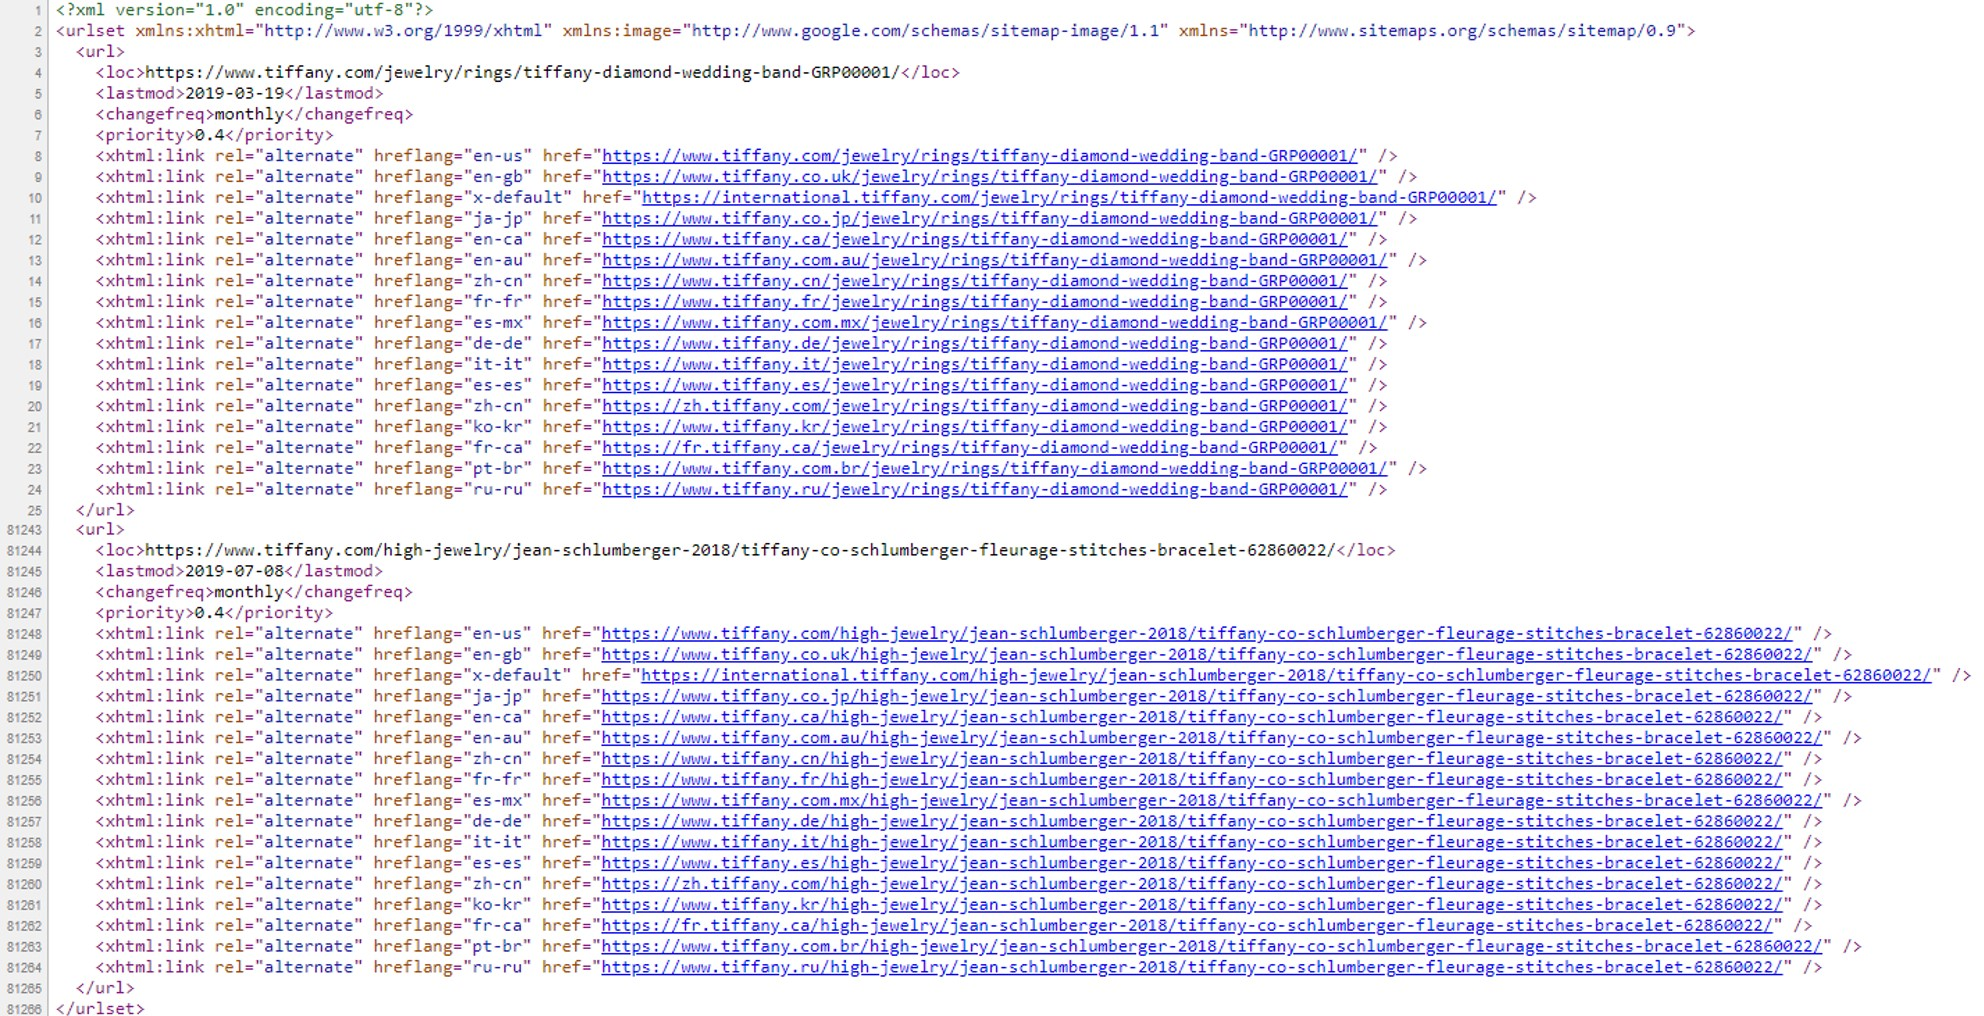 tiffany.com's product xml sitemap